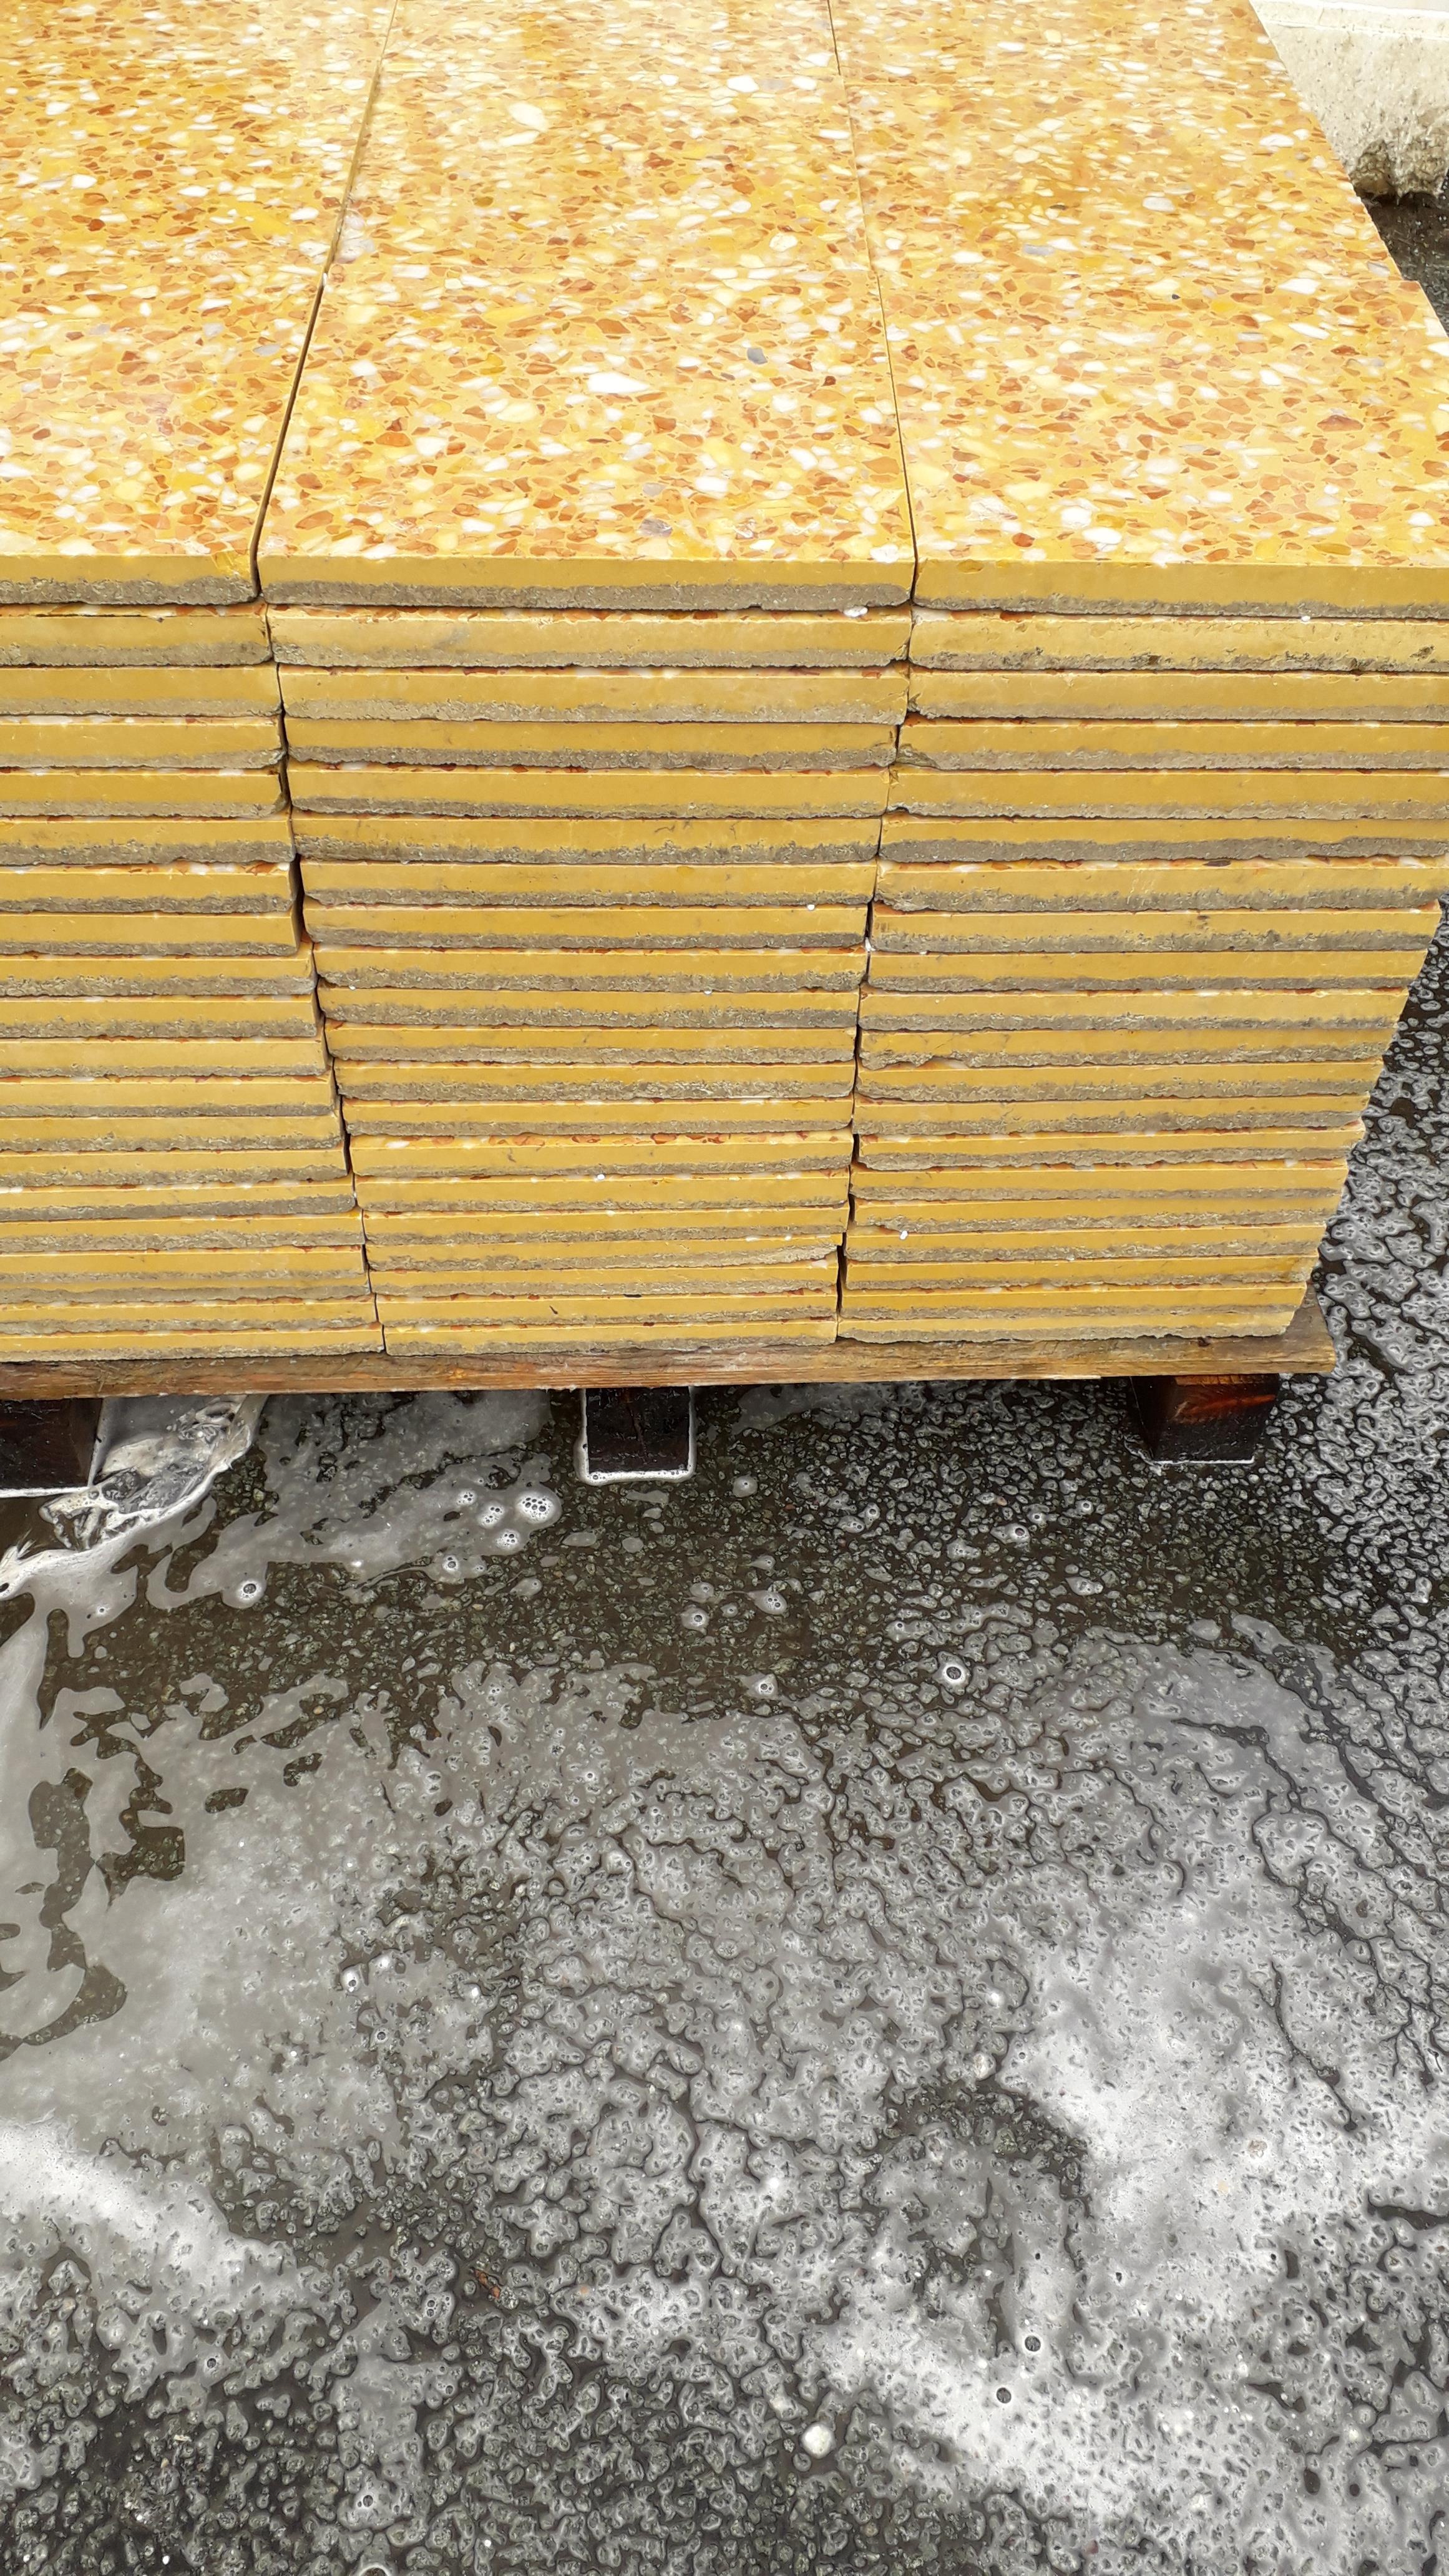 Lot 12 - 1 x pallet (L 07802) Commercial Floor Tiles - Total coverage 20 square yards